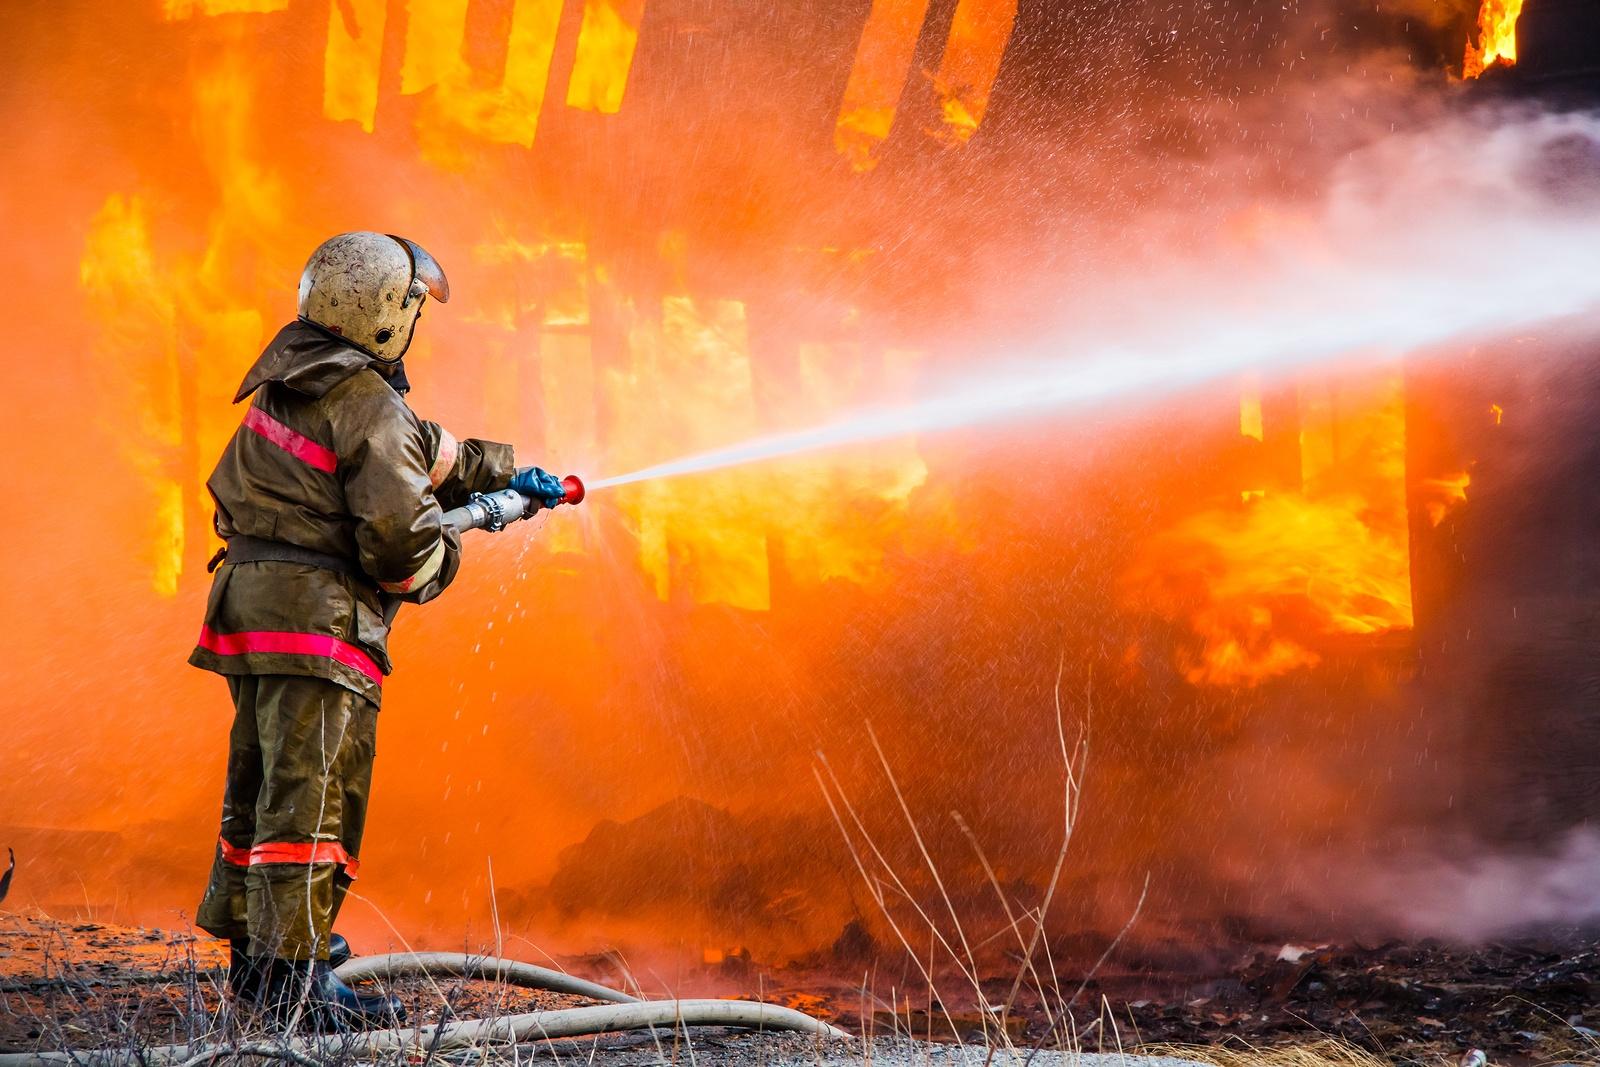 bigstock-Fireman-Extinguishes-A-Fire-91114982.jpg